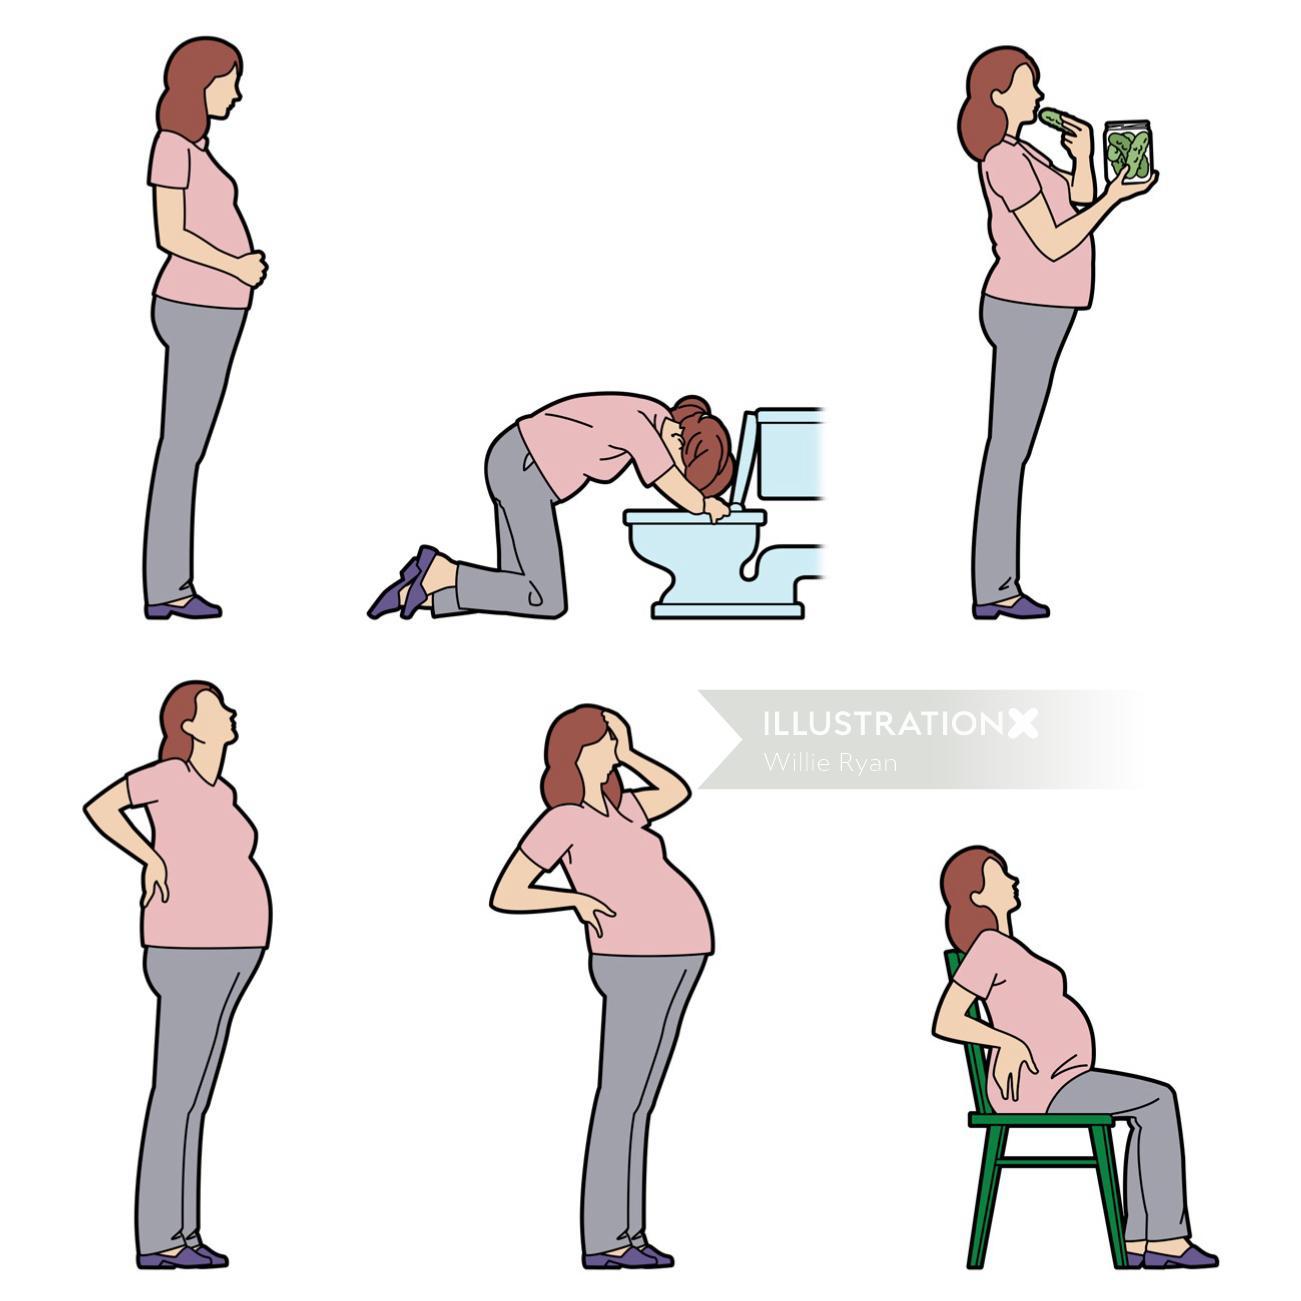 pregnancy stages Willie,Ryan,illustrator,illustration,graphic,children's book,people,figures,health,